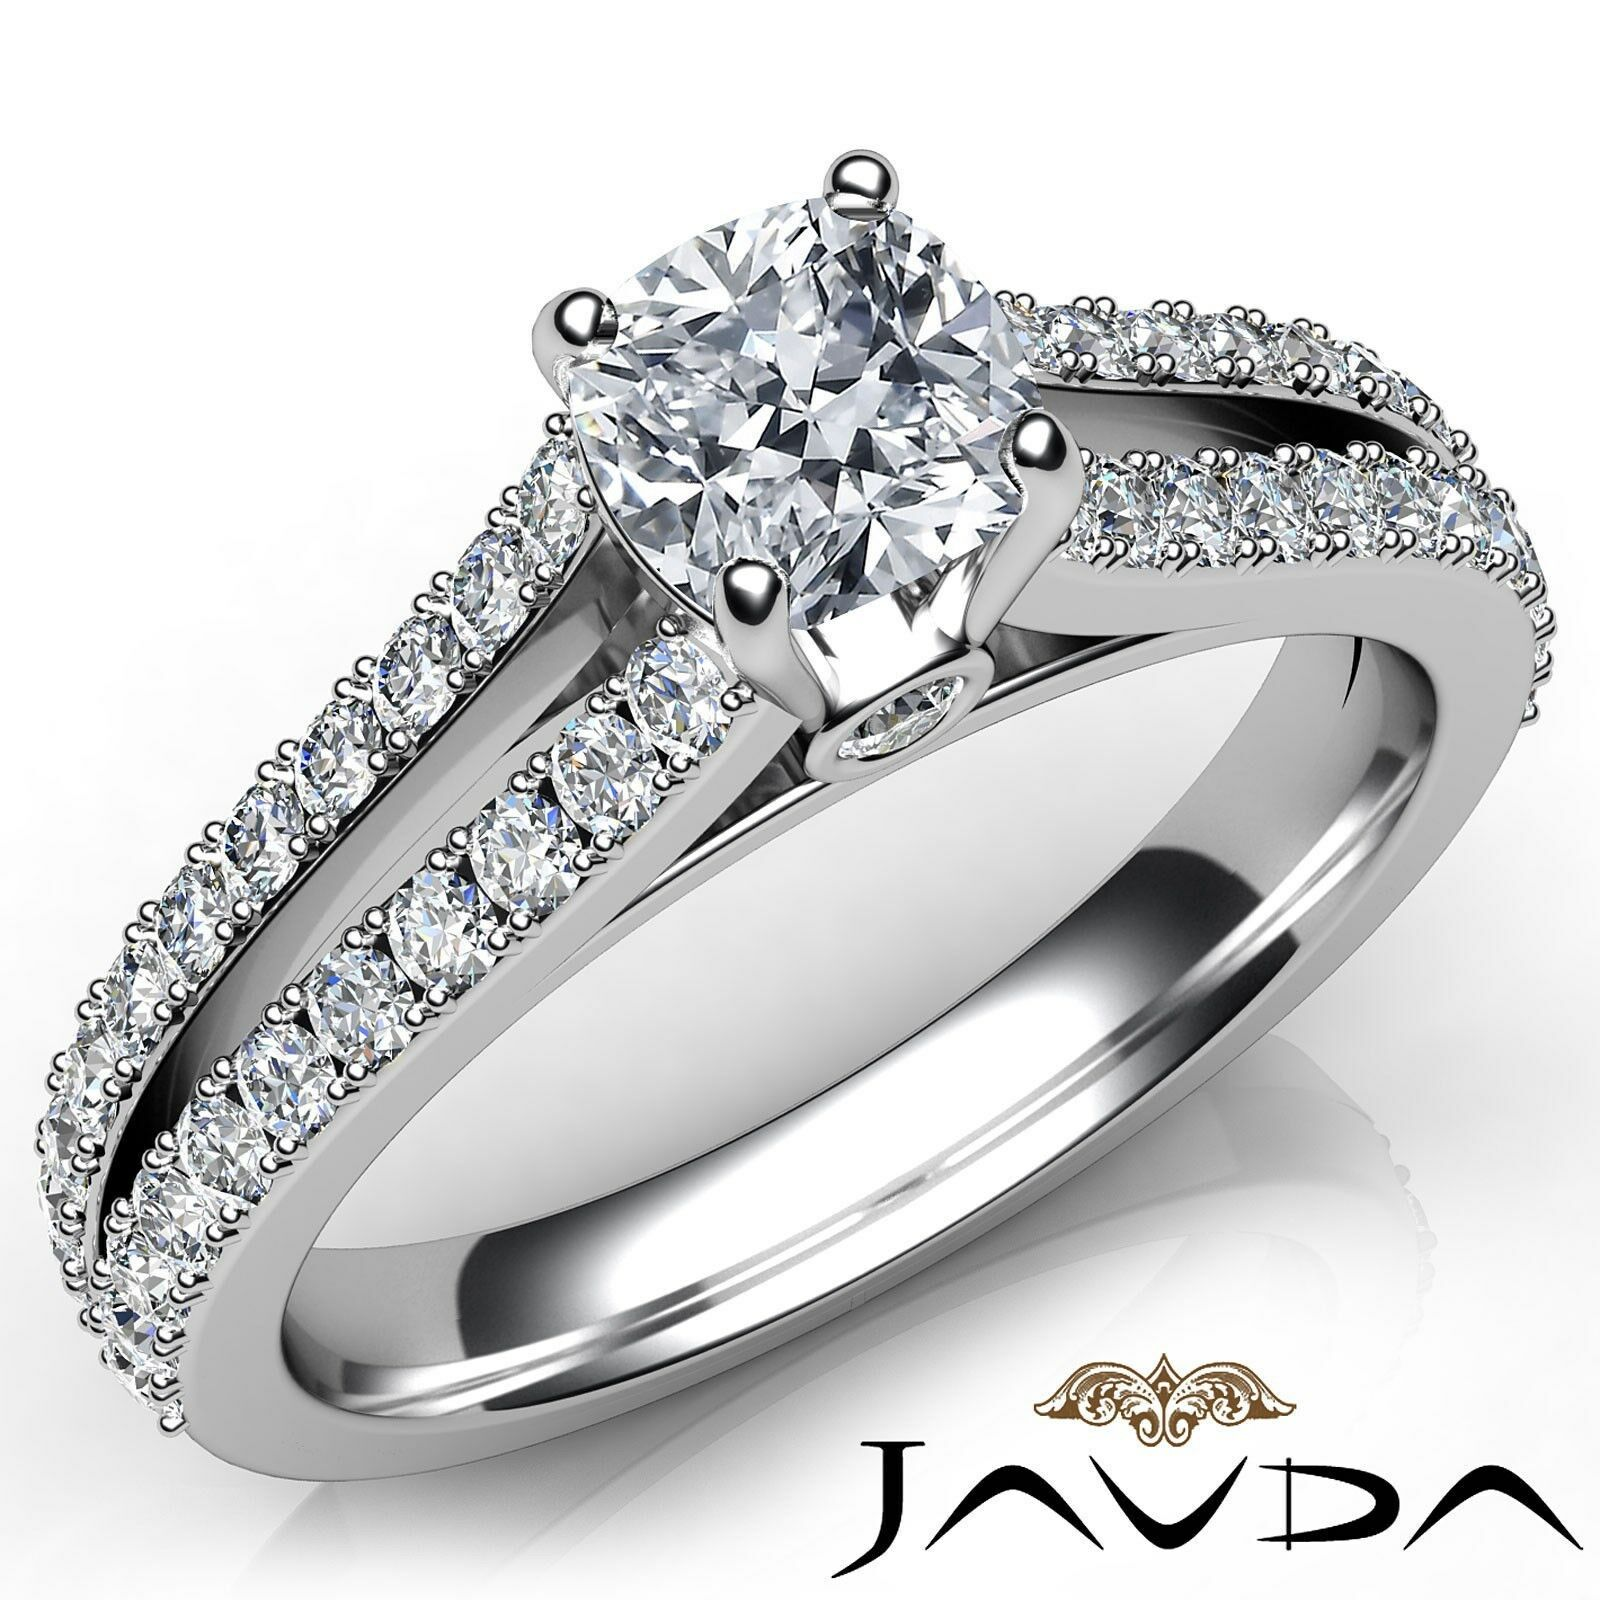 French V Pave Split Shank Cushion Diamond Engagement Ring GIA G VVS2 18k 1.15Ct